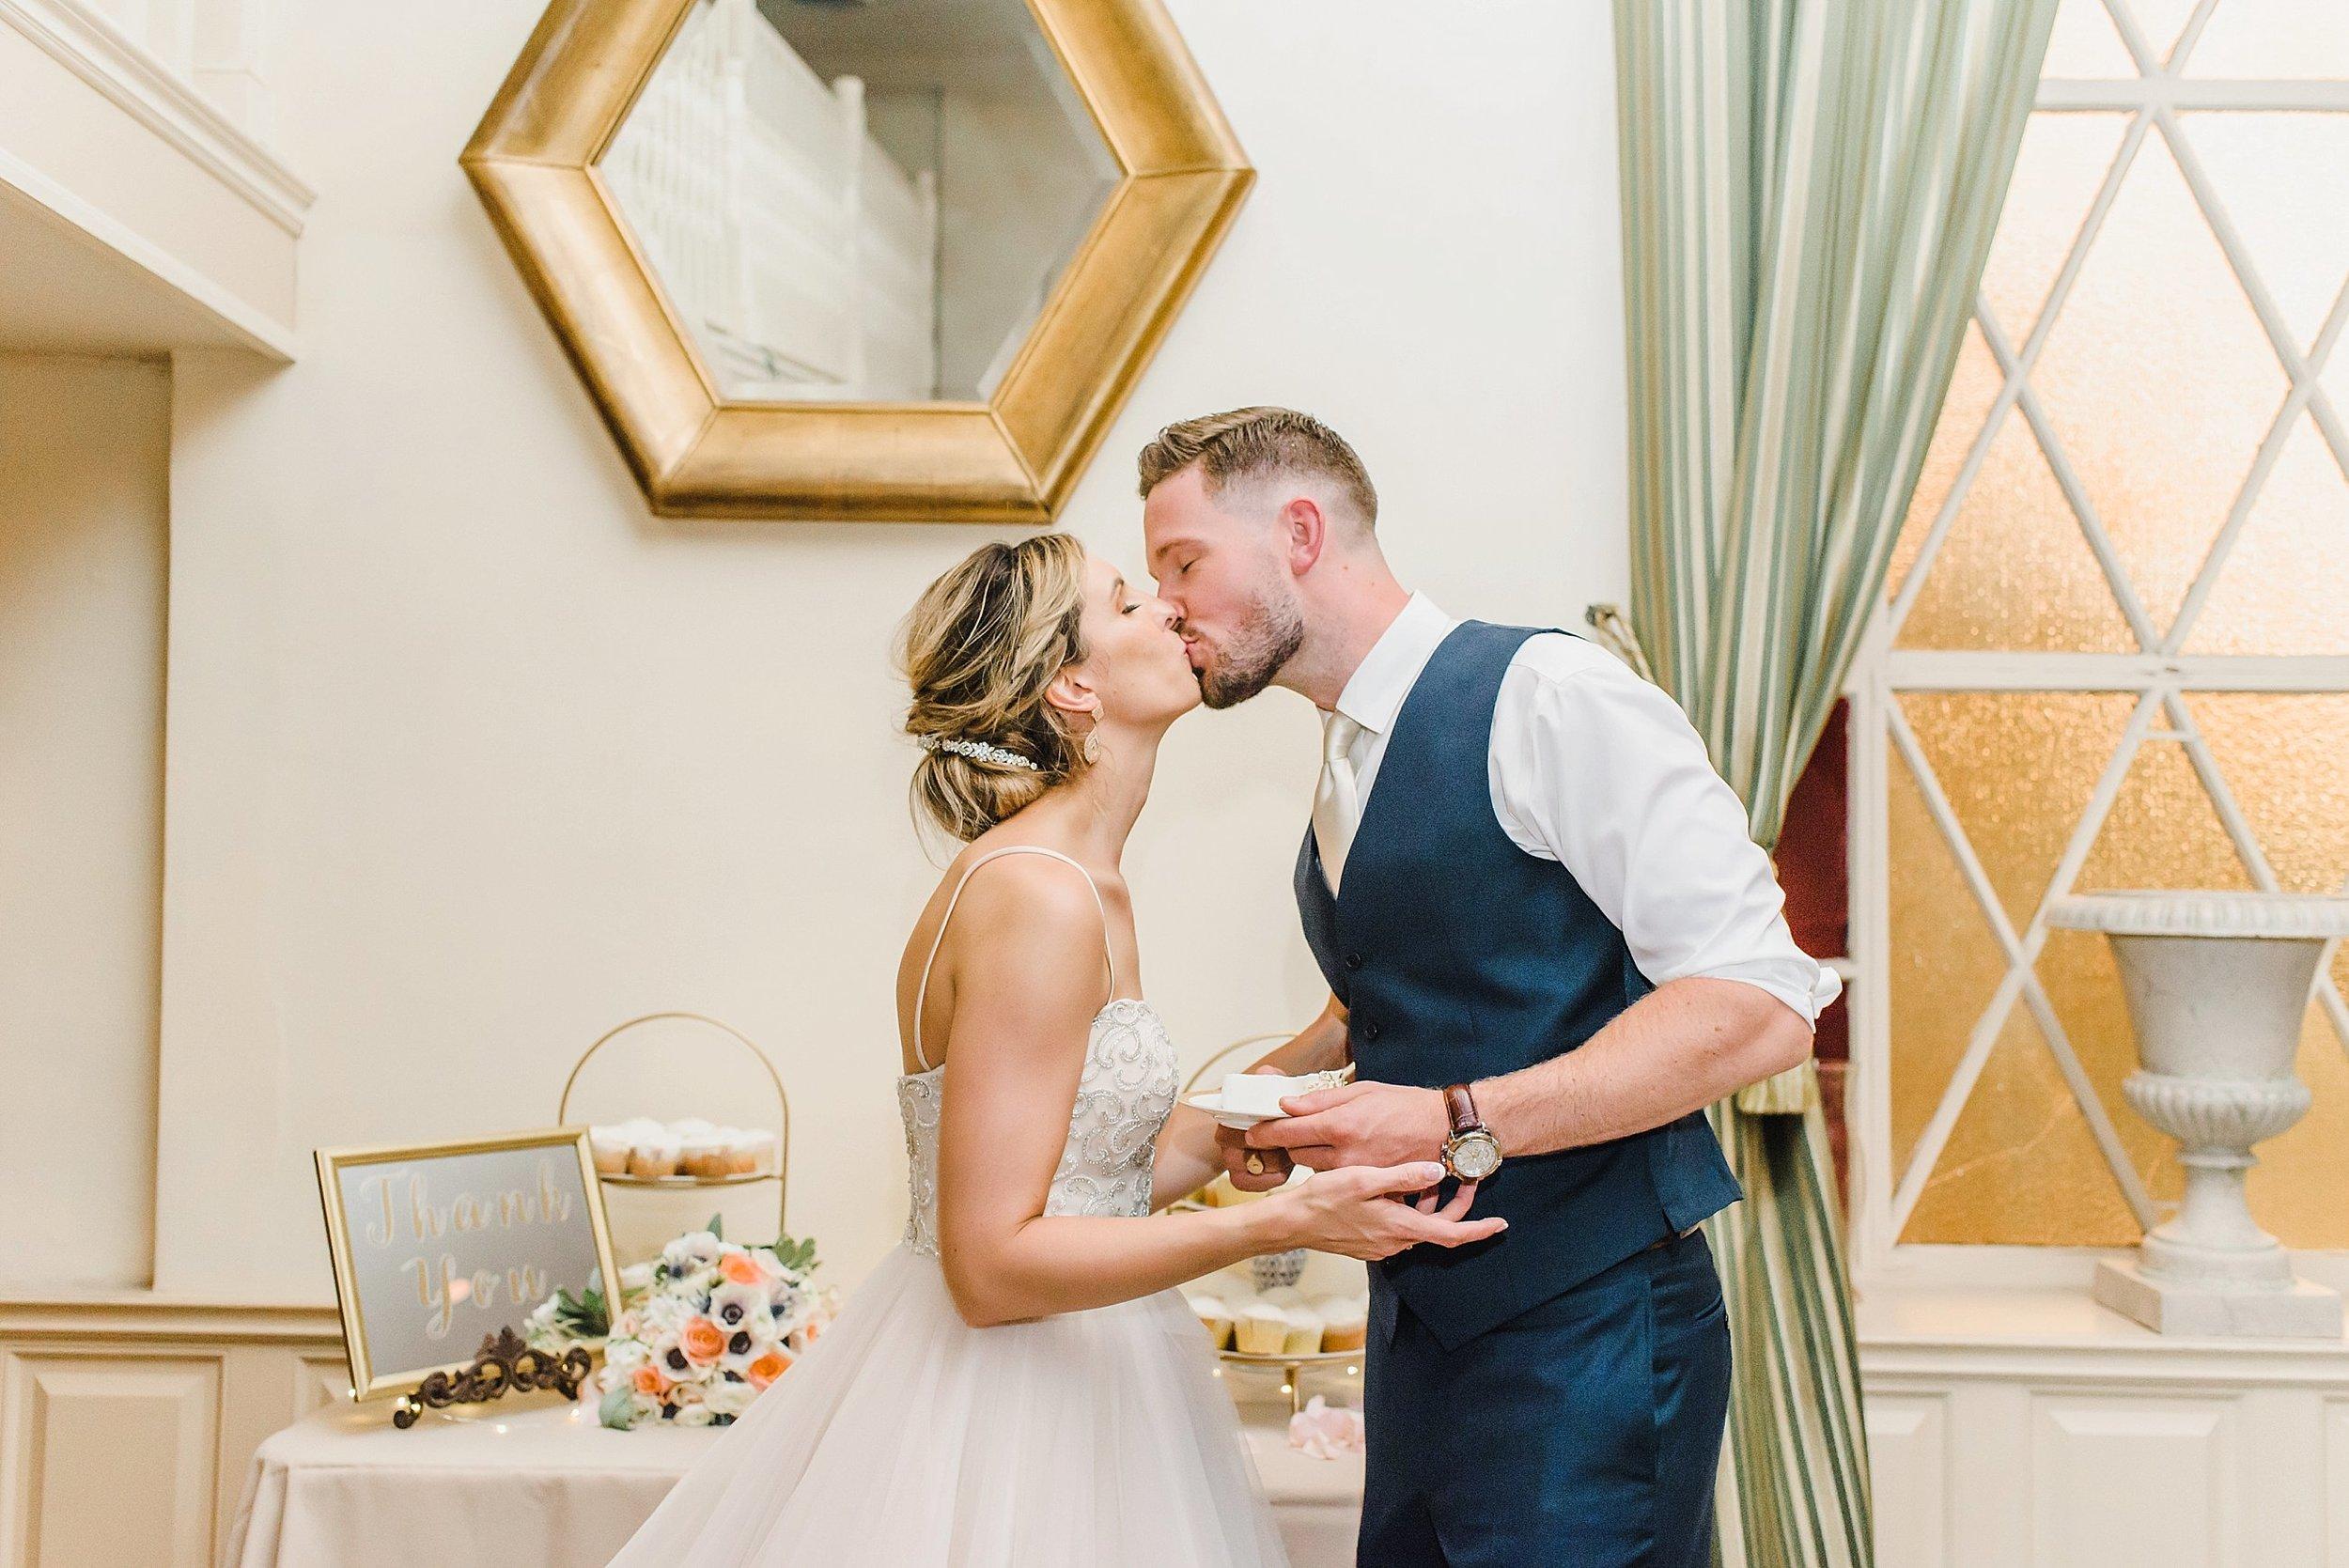 light airy indie fine art ottawa wedding photographer | Ali and Batoul Photography_0232.jpg